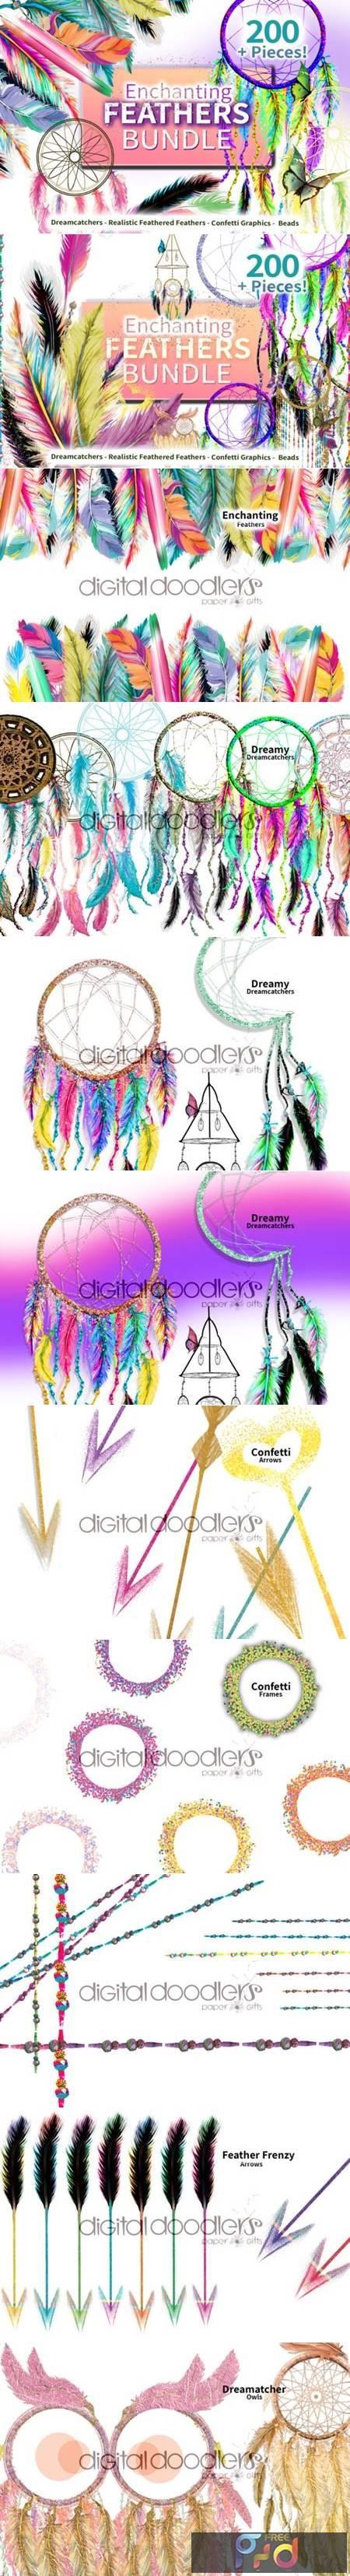 Enchanting Feathers Graphic Bundle 6772245 1